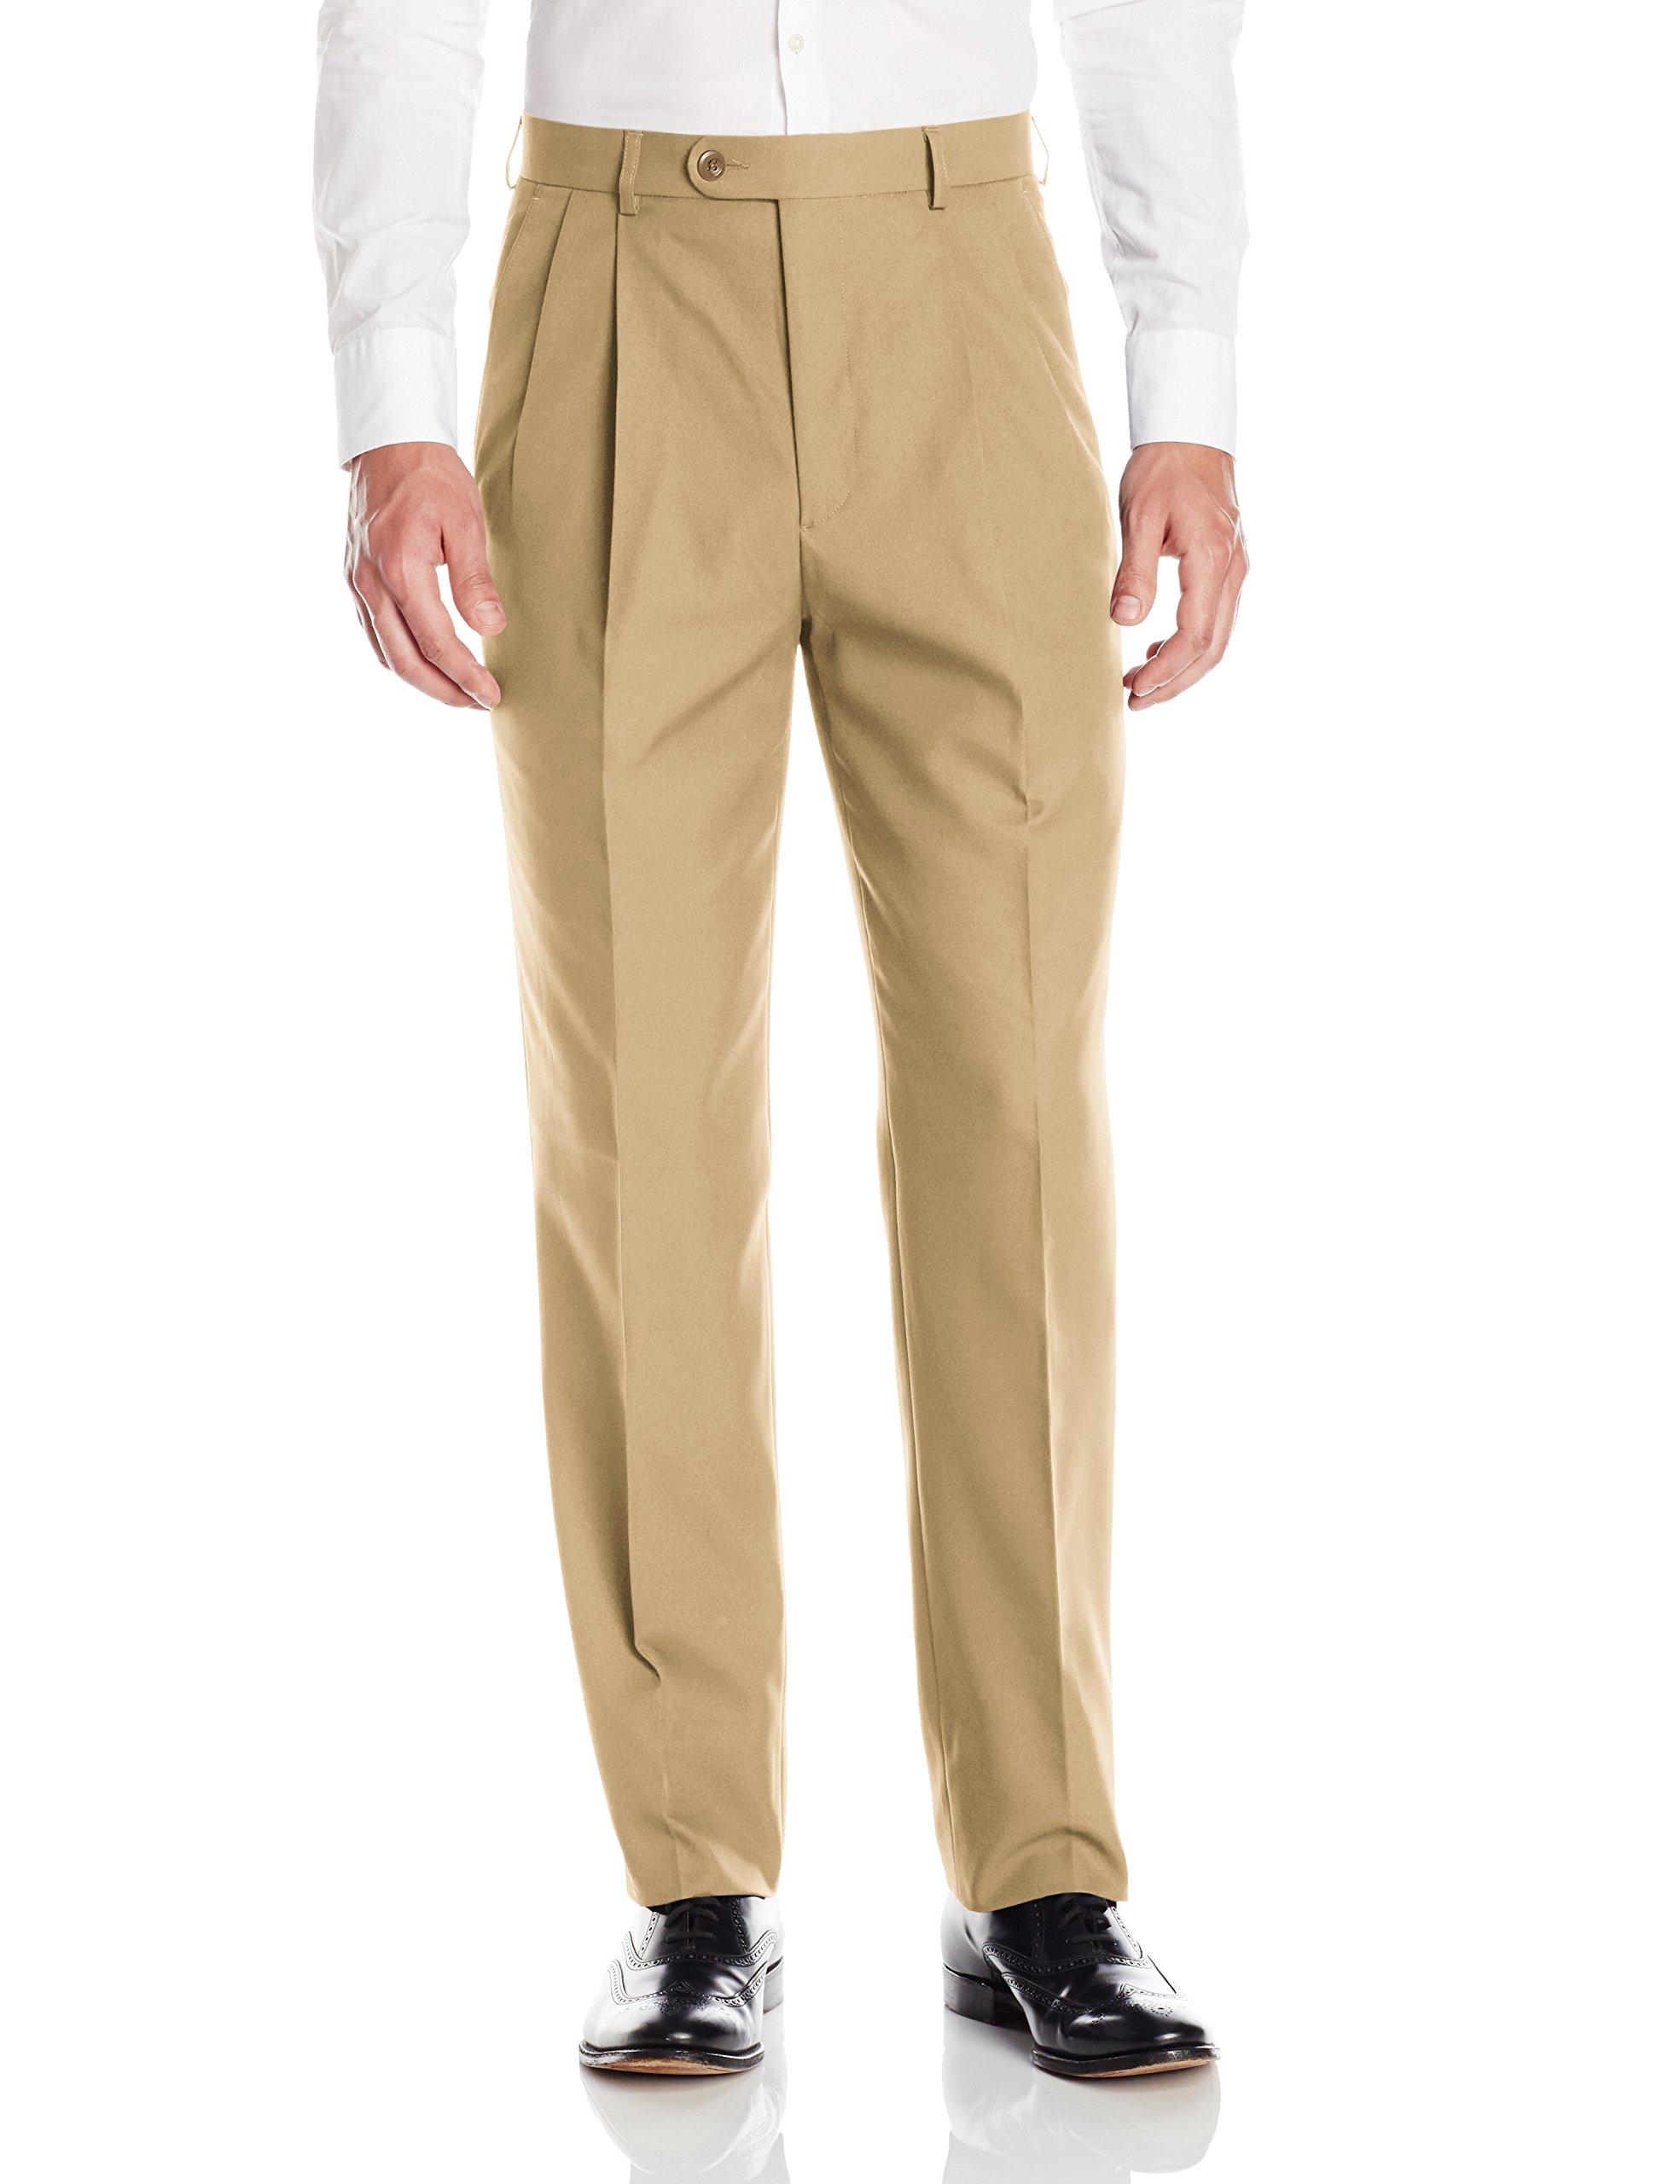 Linea Naturale Men's Pleated Washable Microfiber Twill Trouser, Camel, 35W